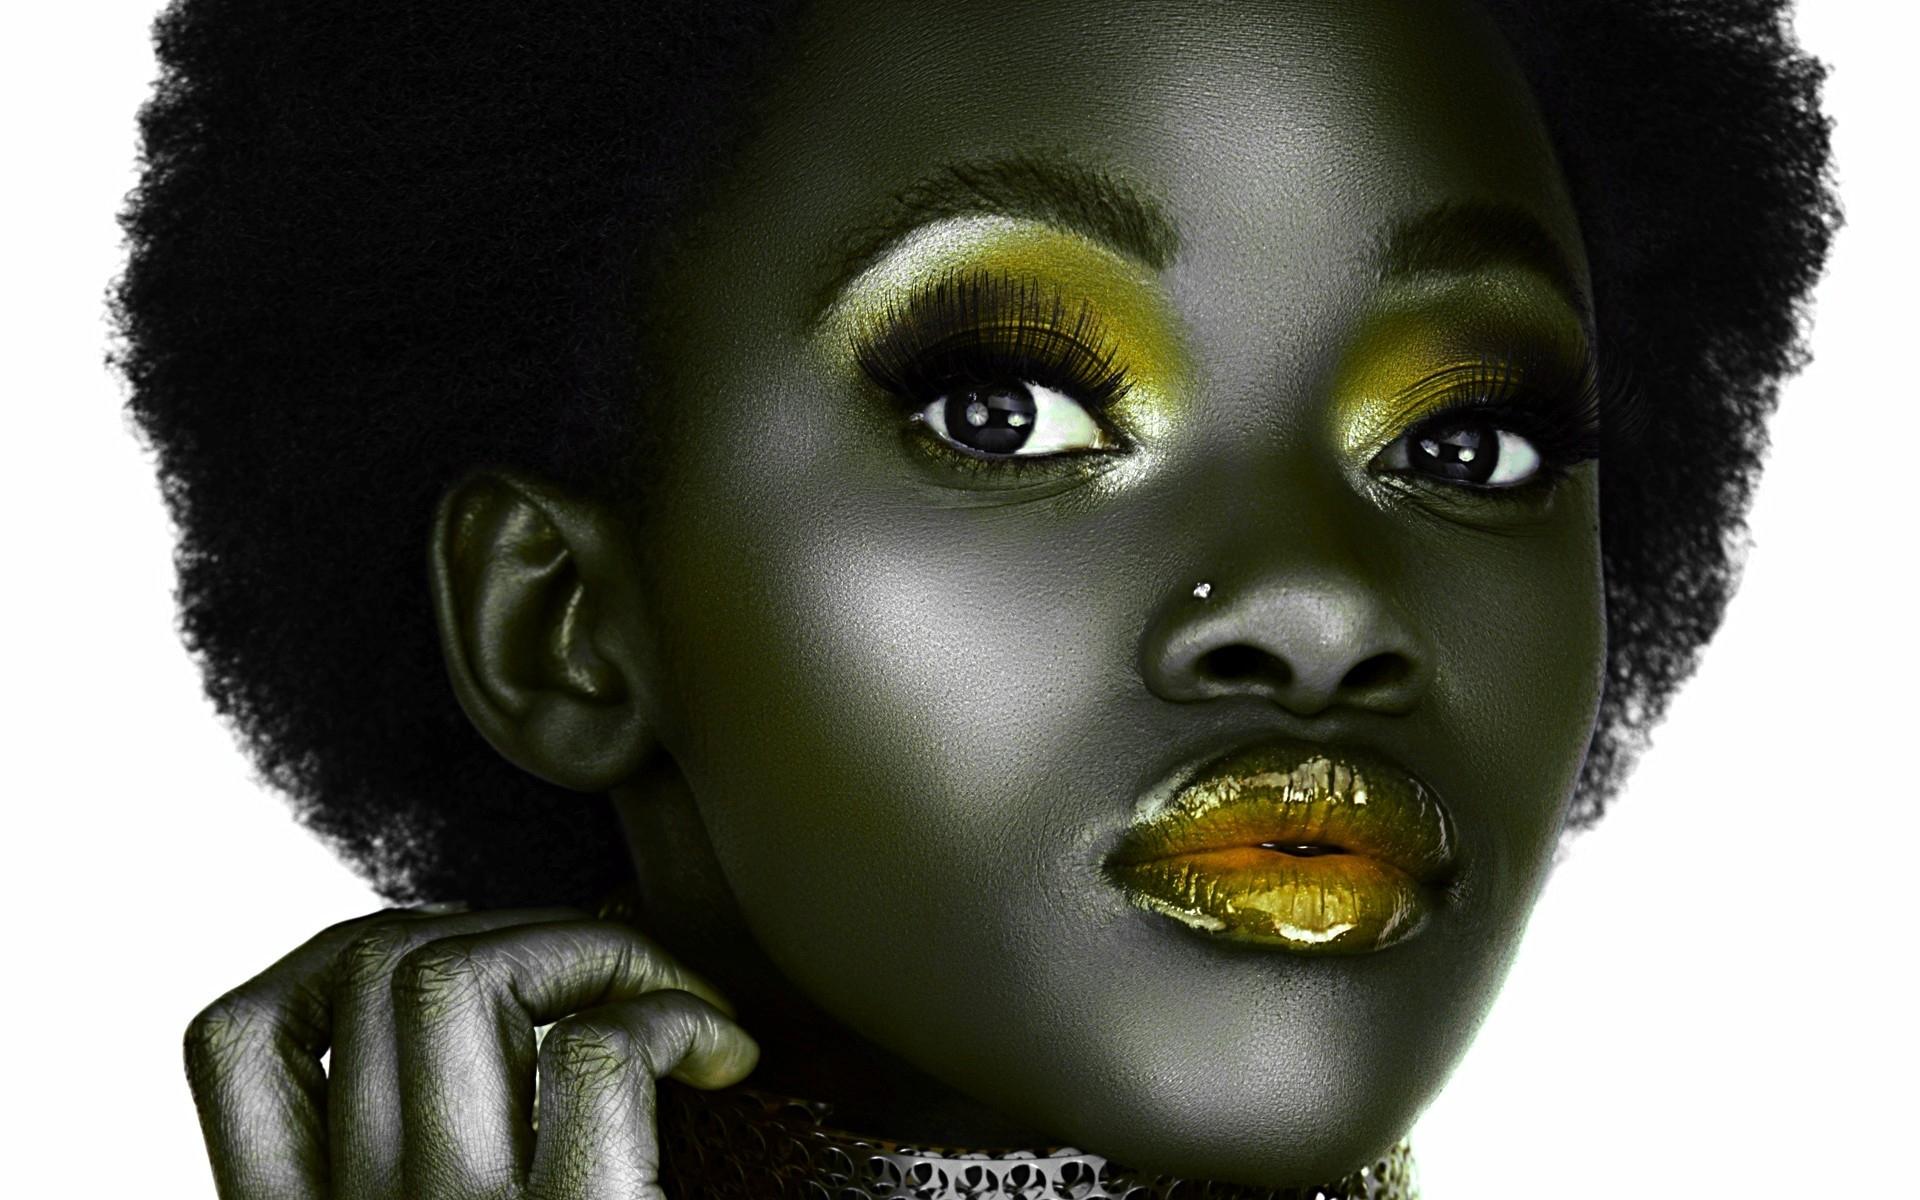 free black girl Now Watching: Nomisupasta's Care- Free Black Girl Ditty.